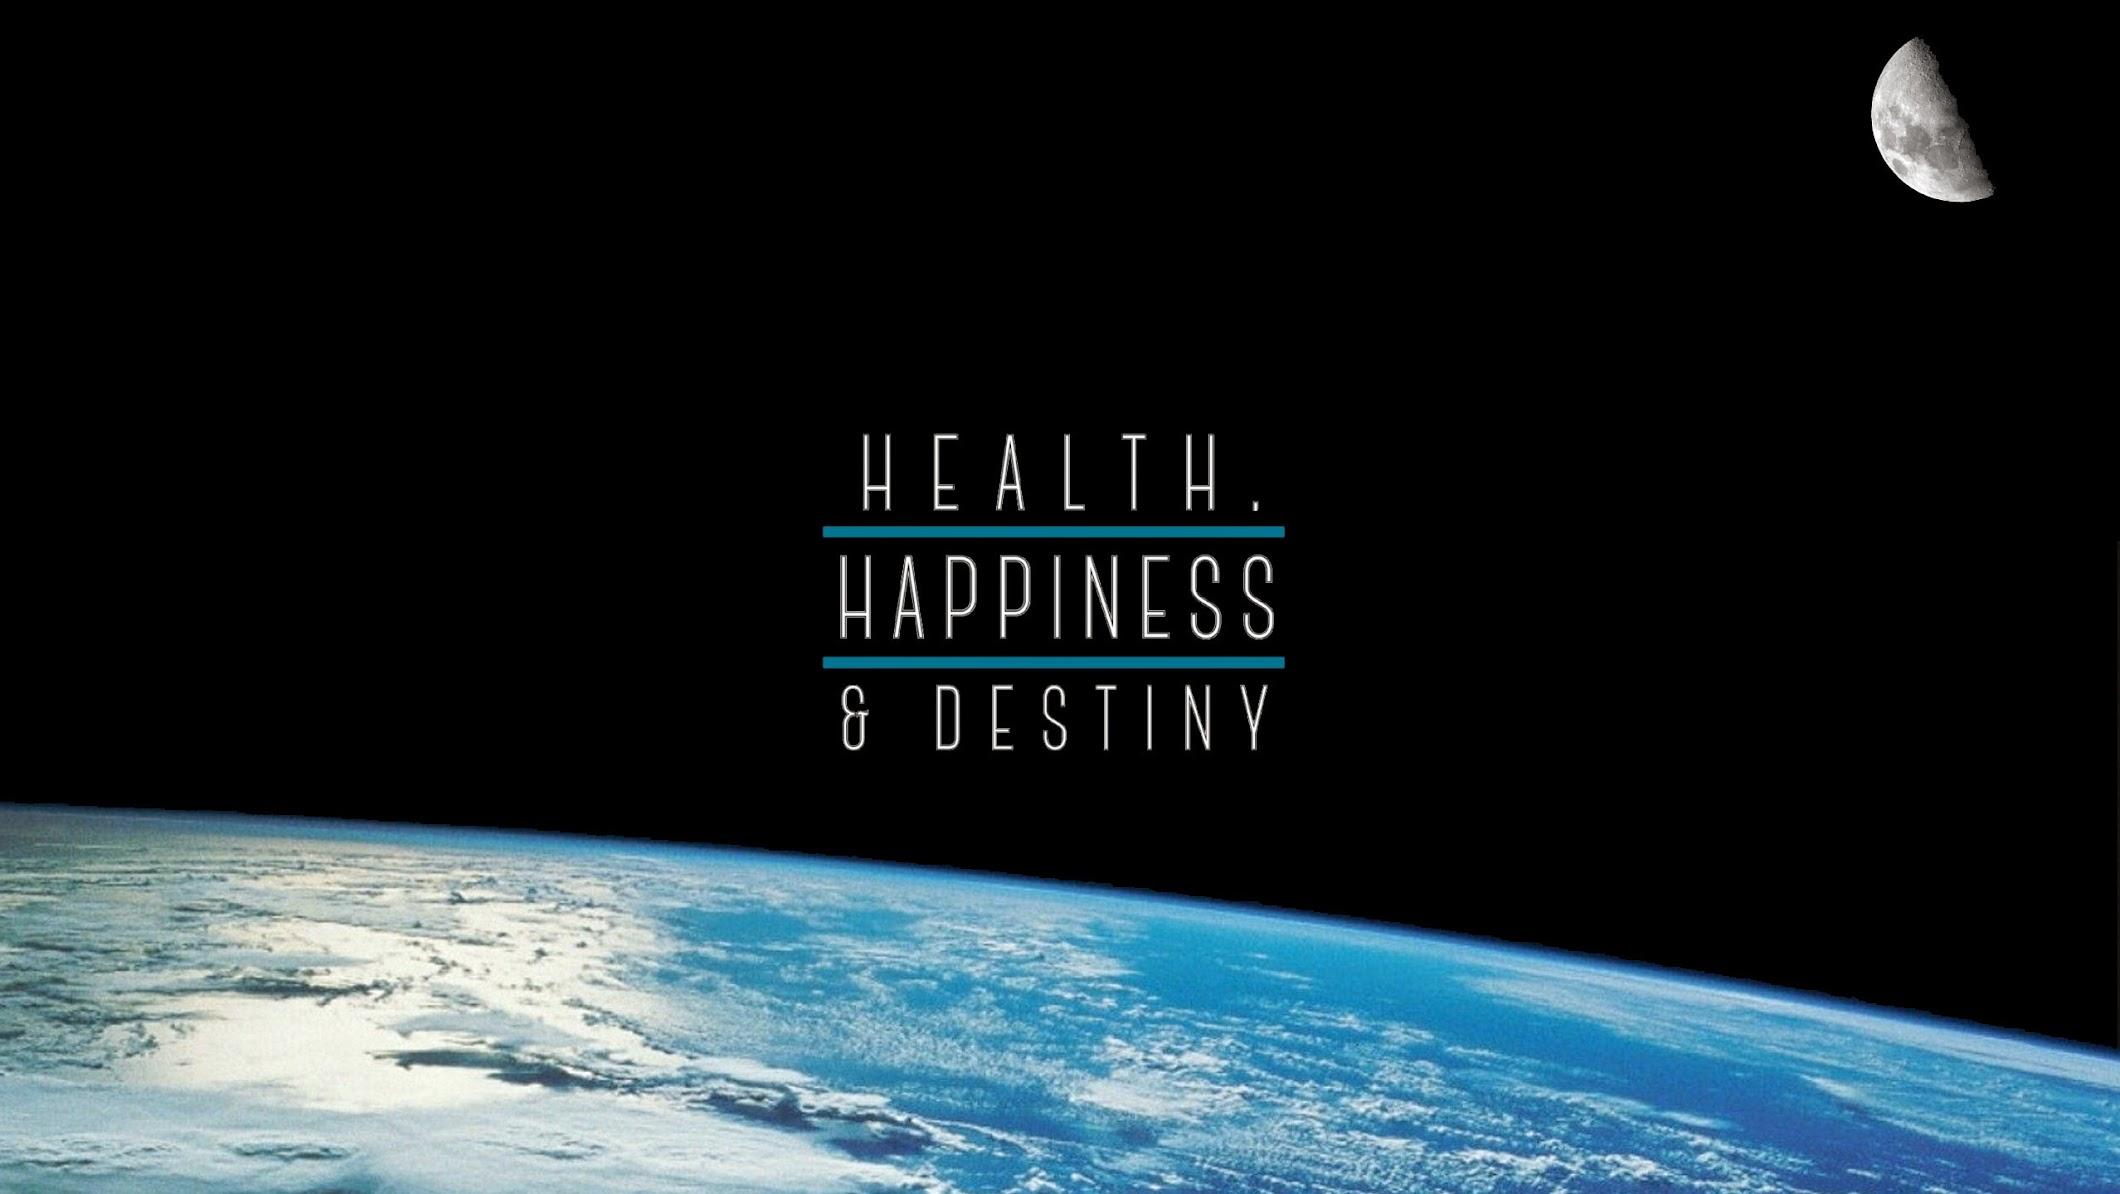 Health, Happiness & Destiny